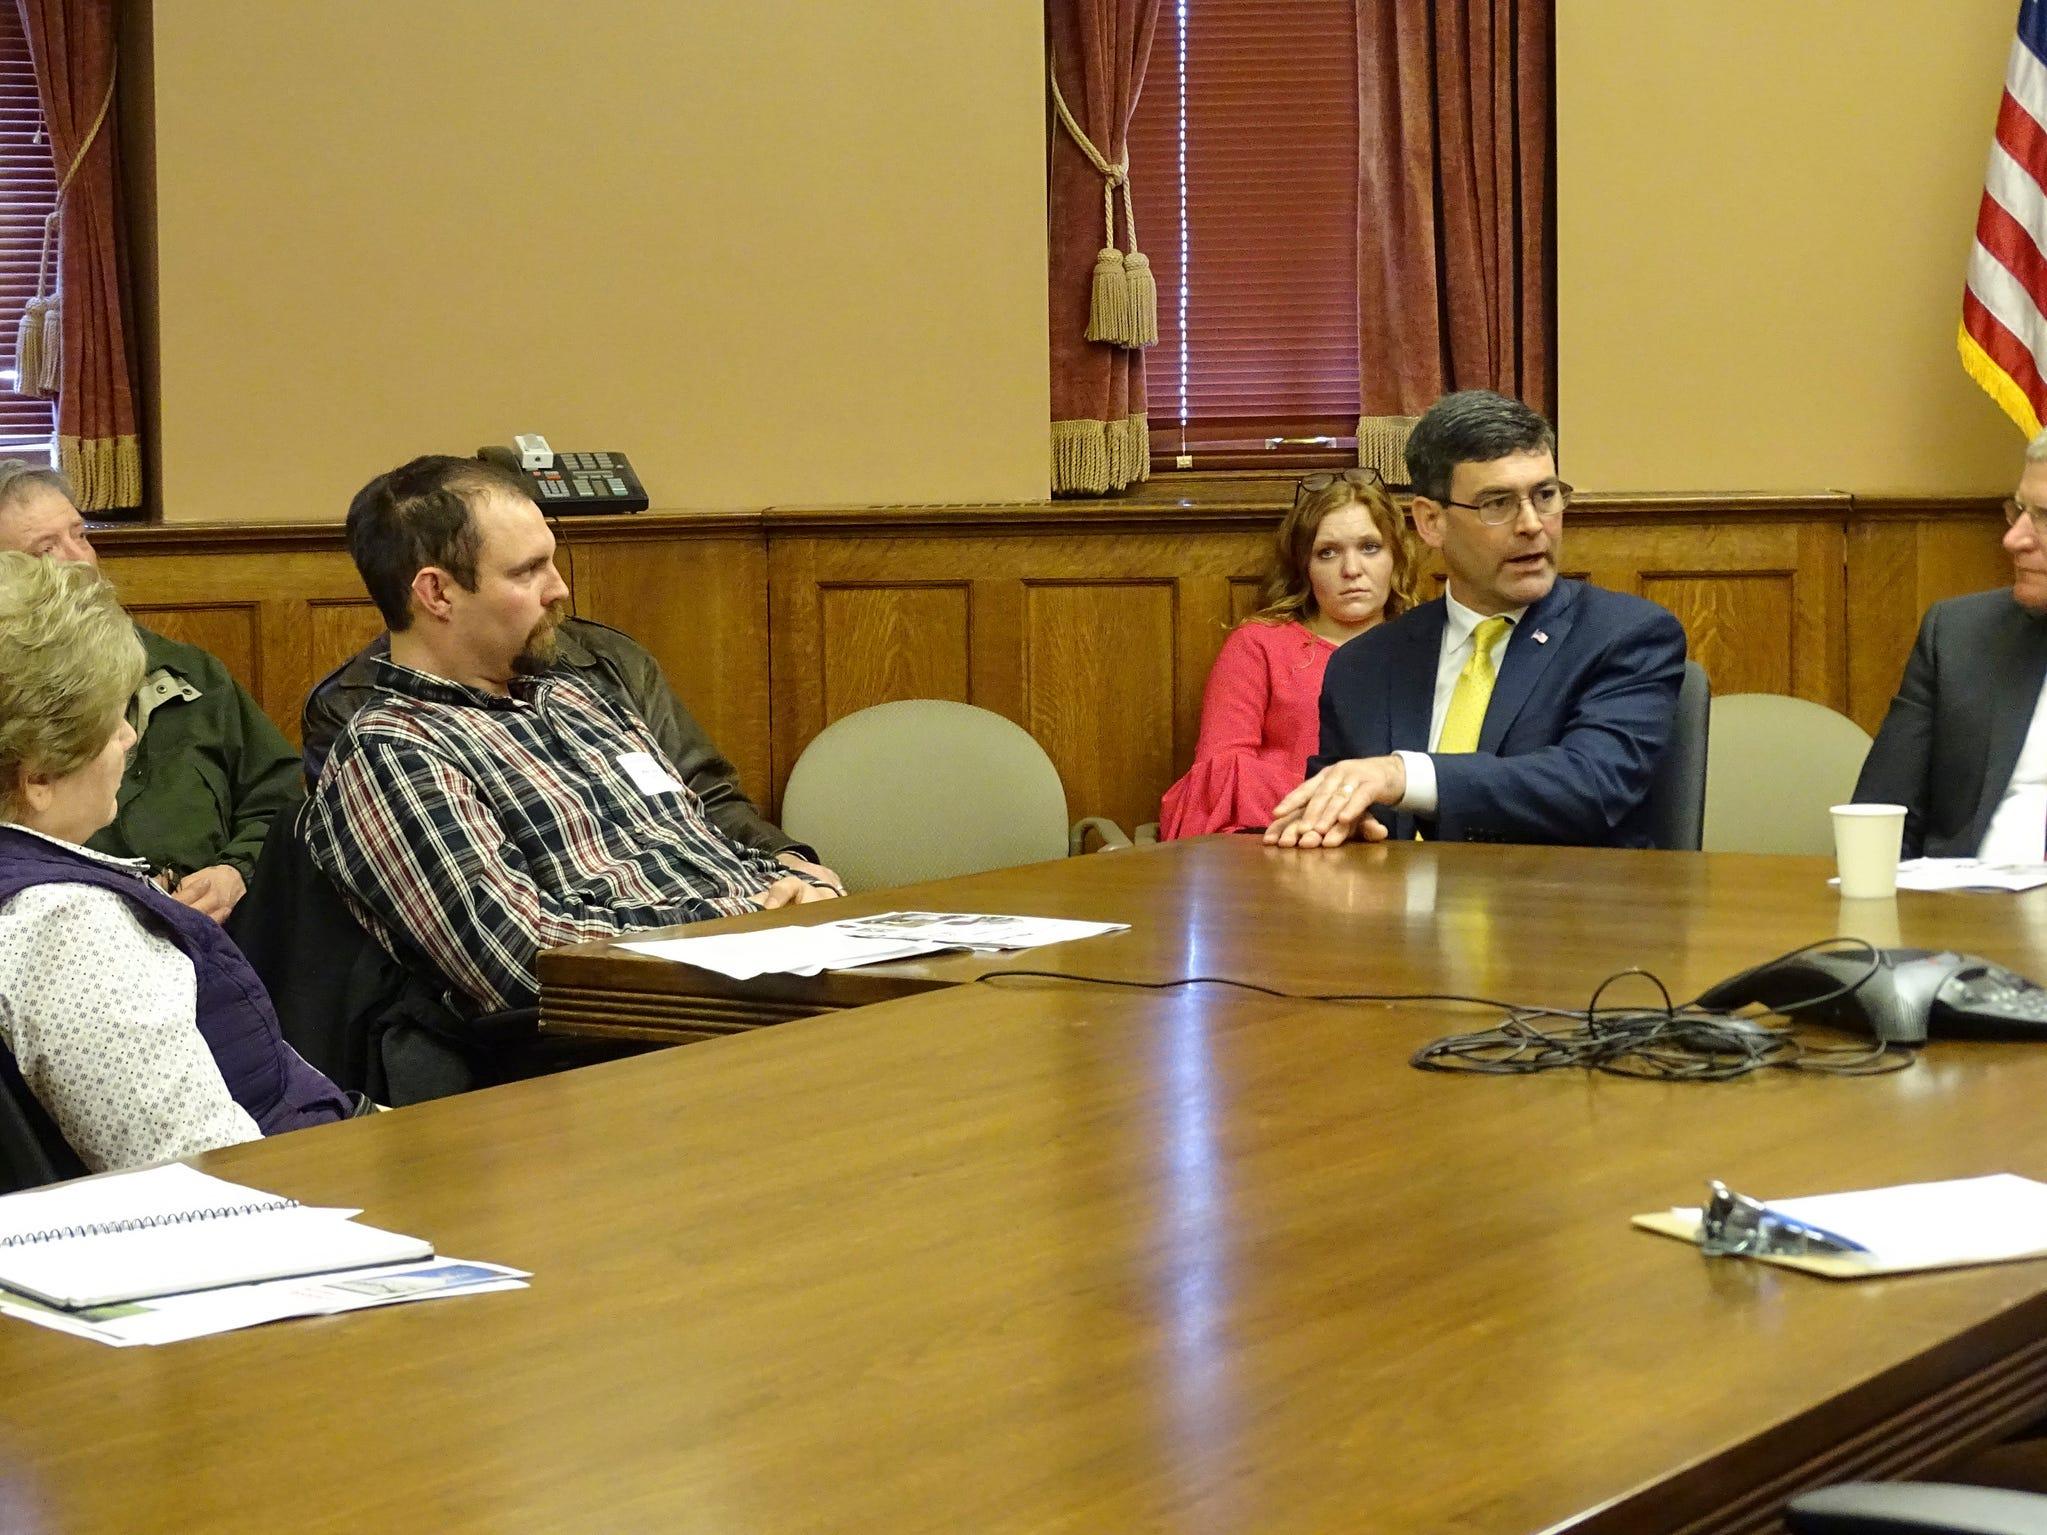 Mike Turner, Sauk County Farm Bureau president, helped facilitate discussions on behalf of Farm Bureau members with Rep. Kurtz, Senator Marklein, Rep. Tranel and Rep. Novak.